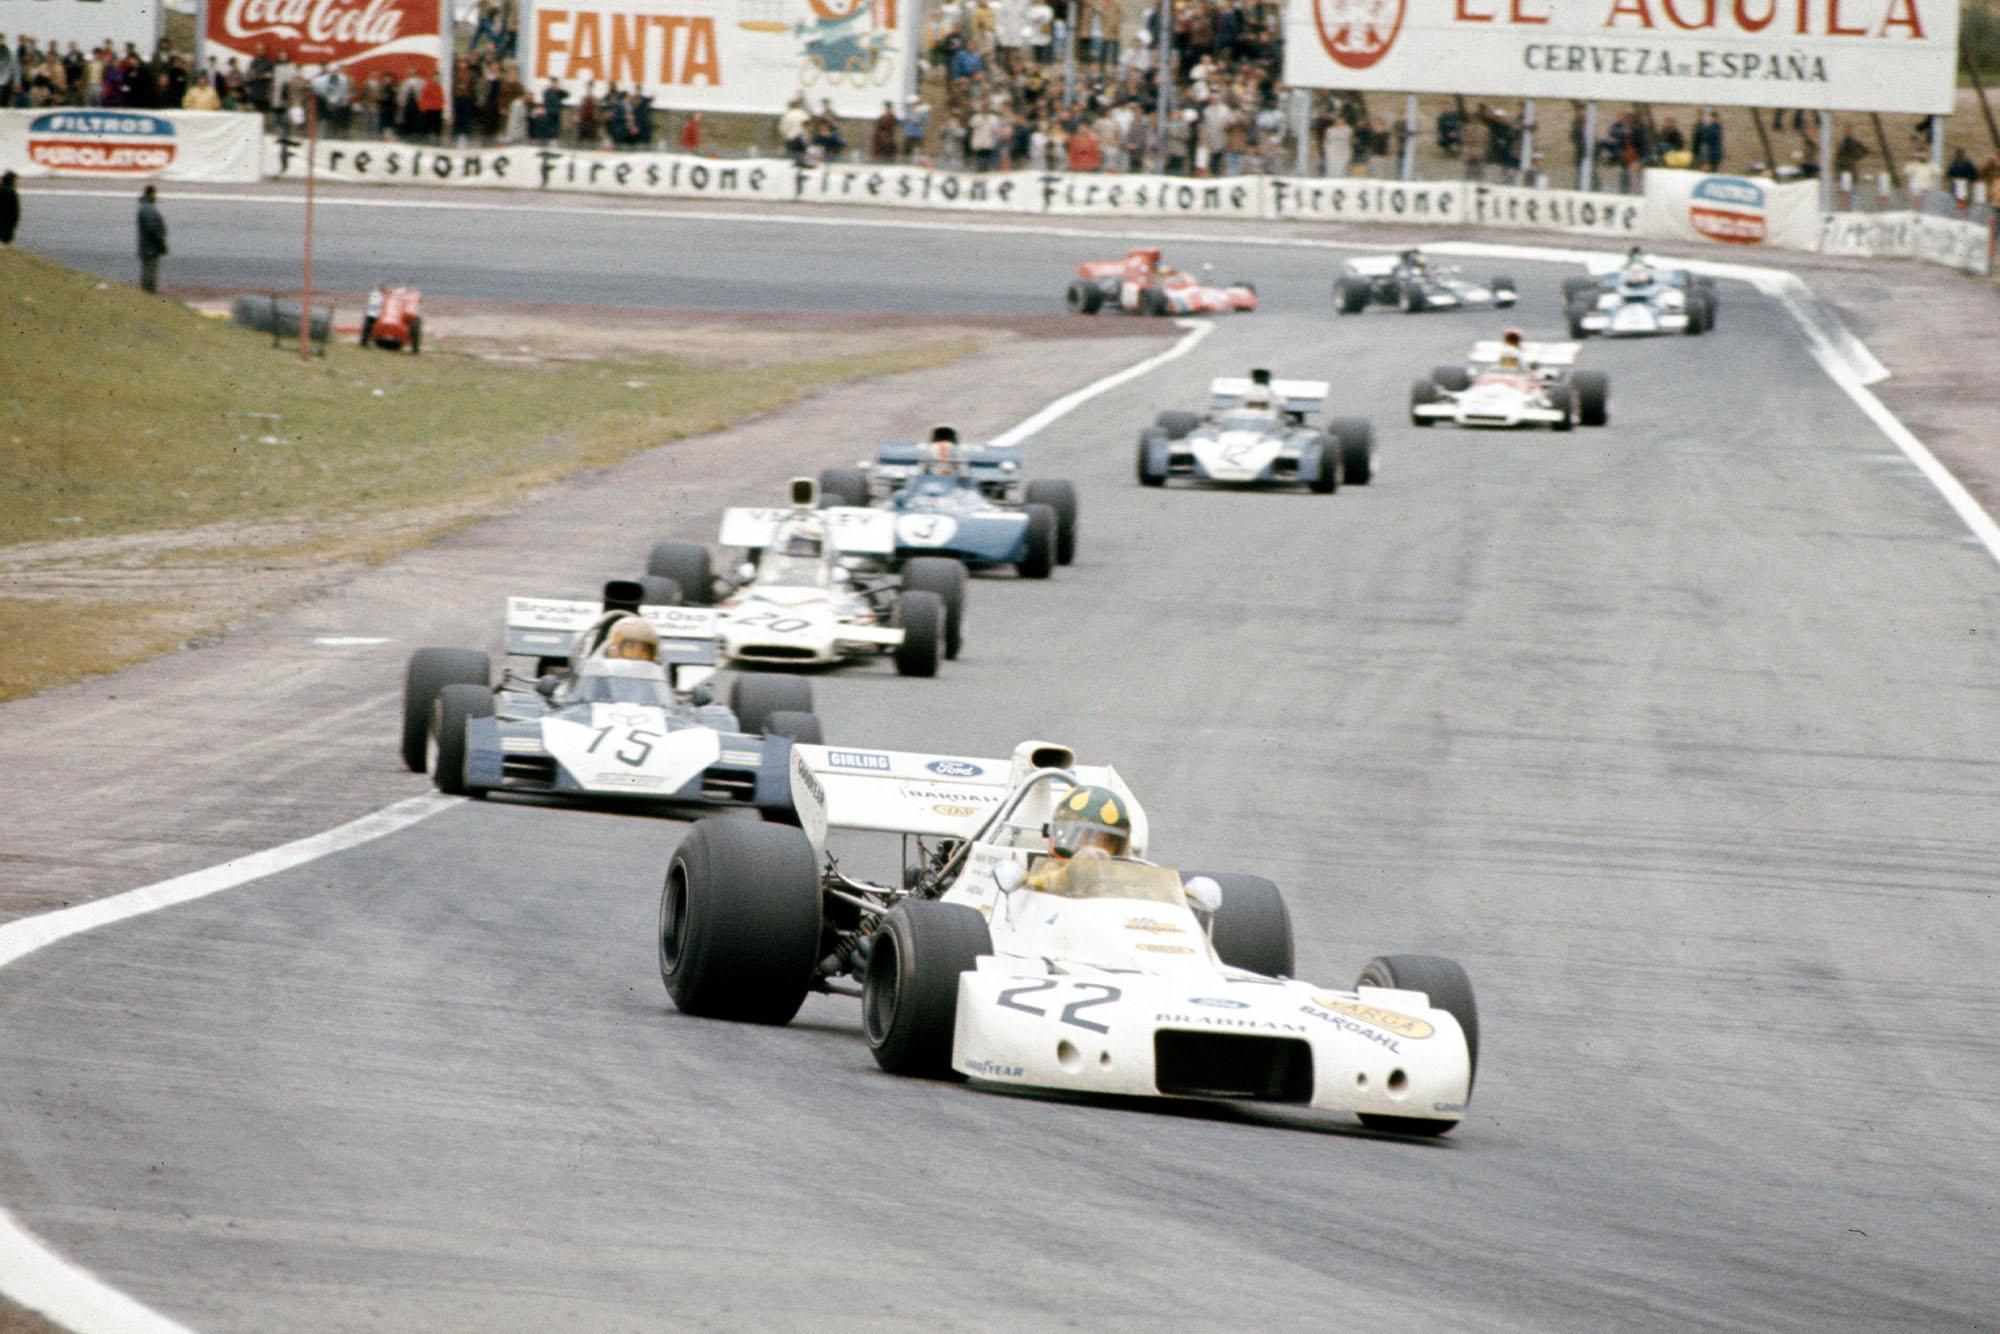 Brabham's Wilson Fittipaldi leads the midfield pack during the 1972 Spanish Grand Prix, Jarama.